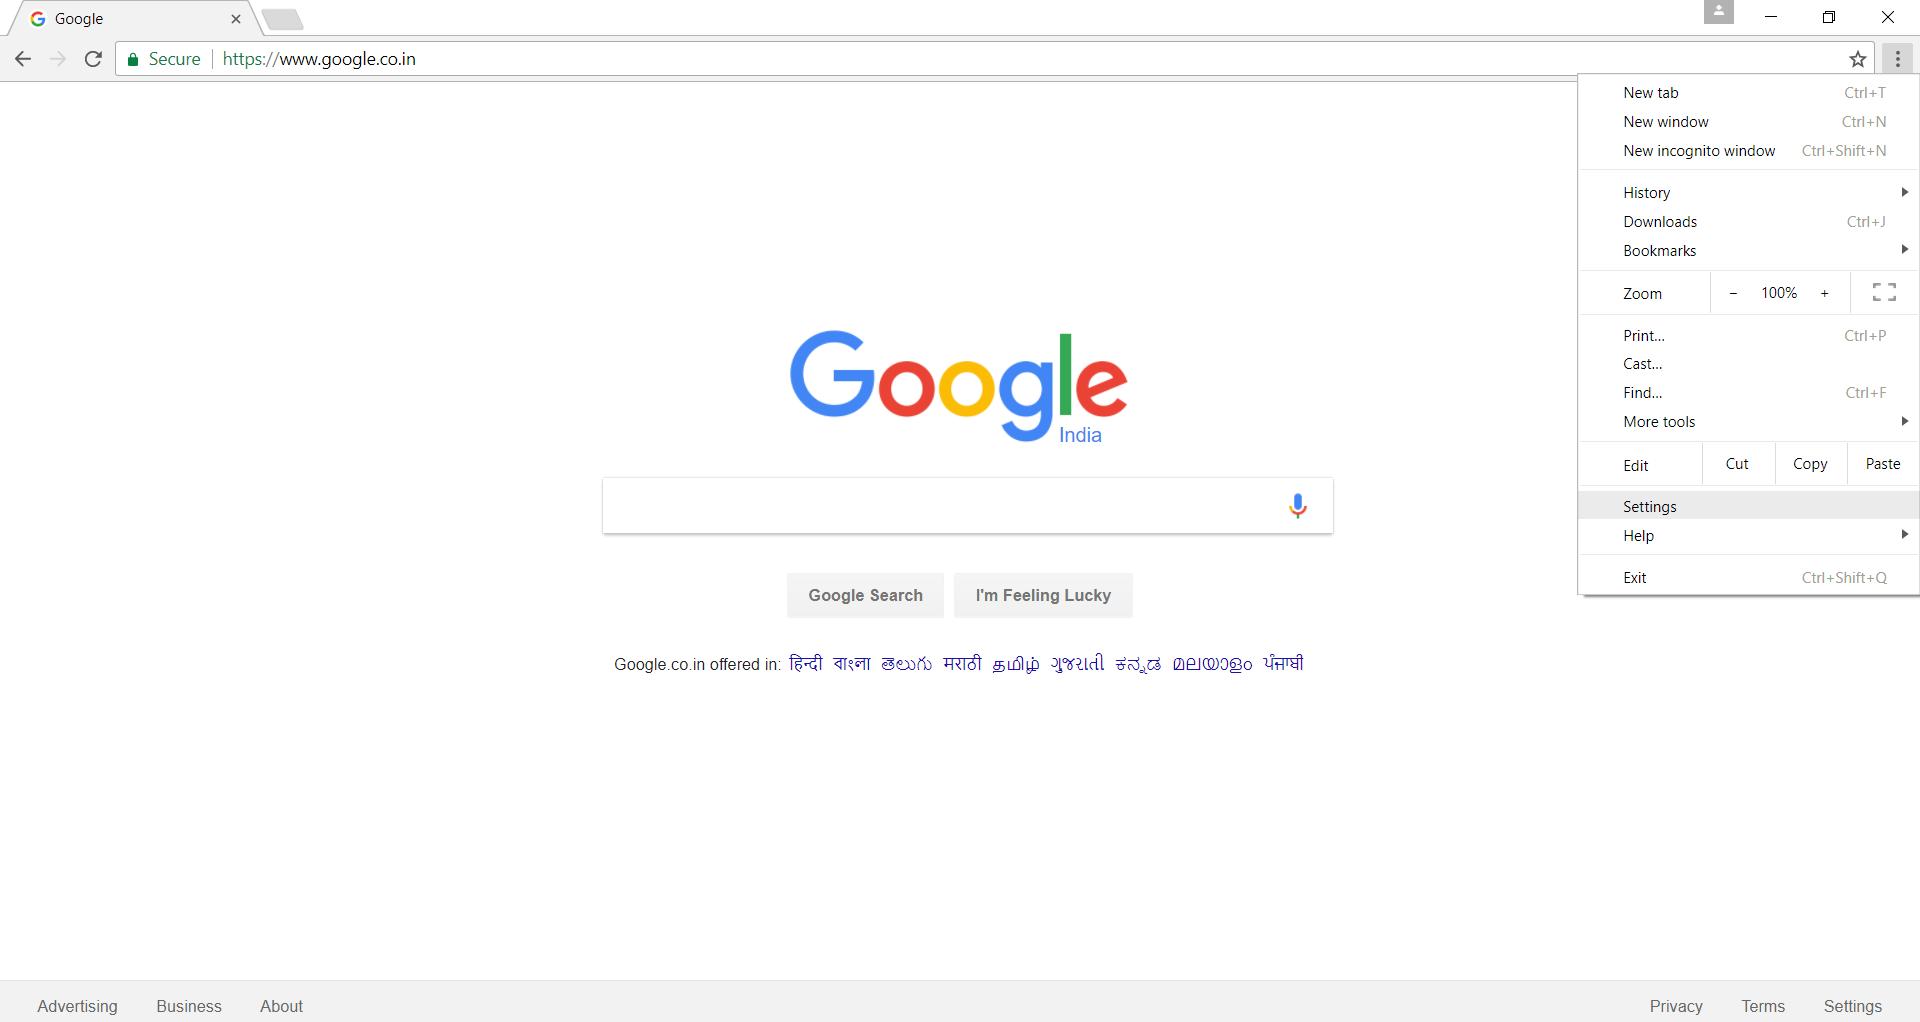 Google chrome home page shortcut - Step 2